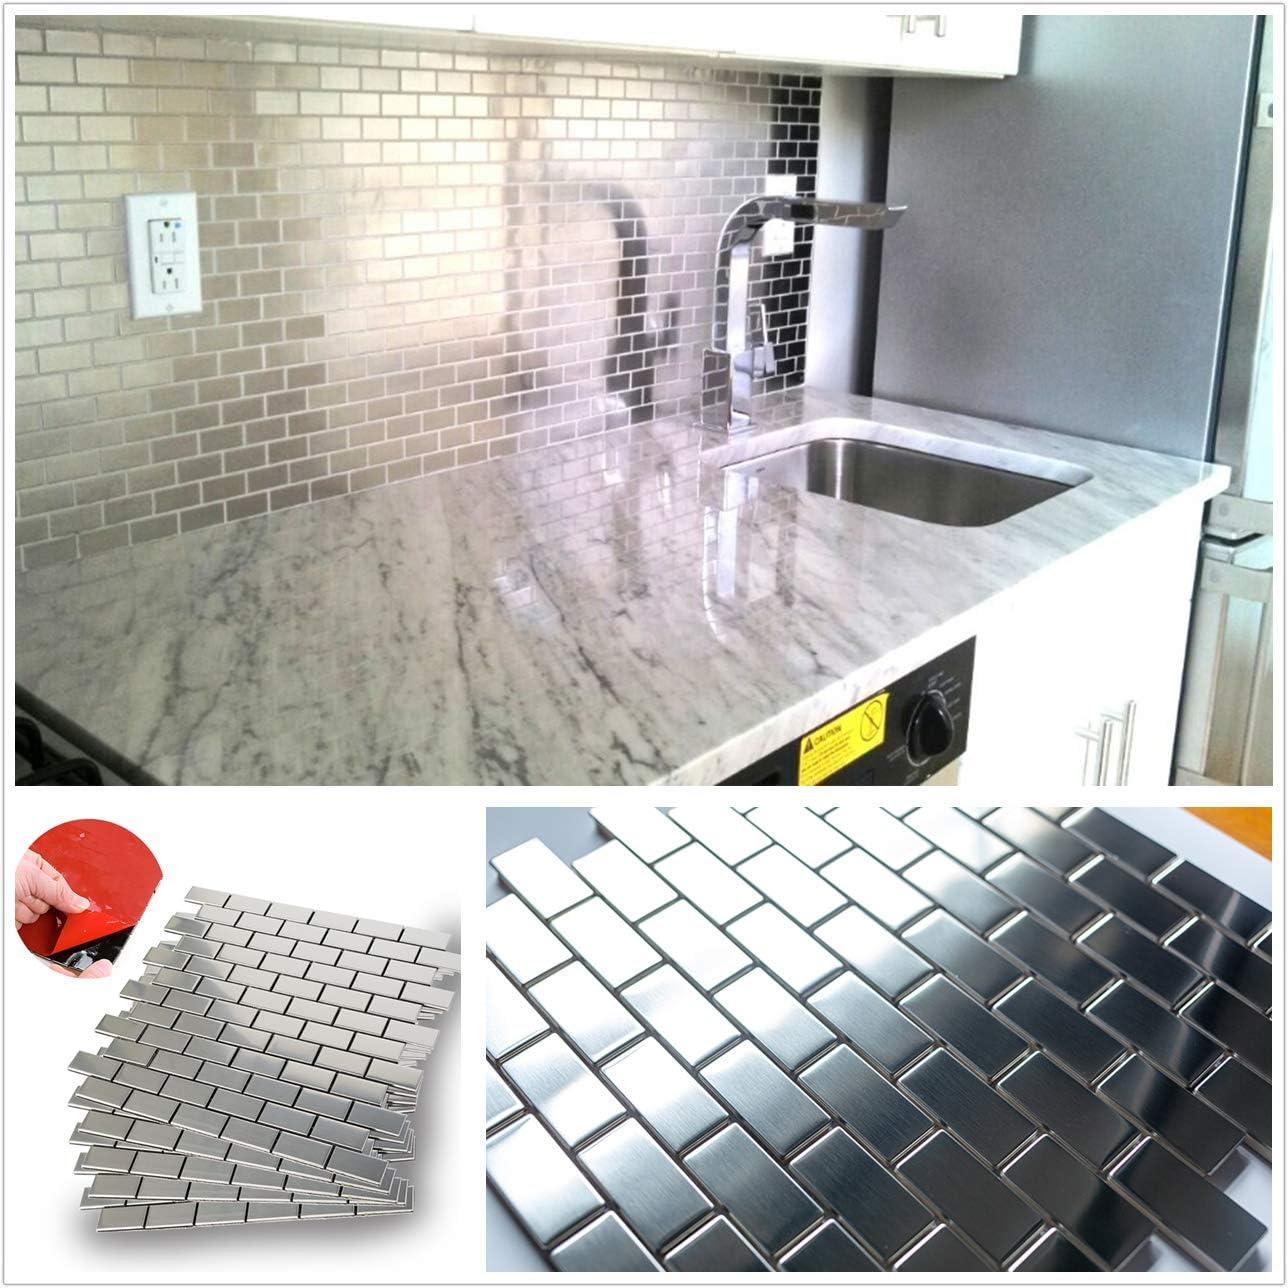 - Amazon.com: HomeyMosaic Subway Stainless Steel Surface Peel And